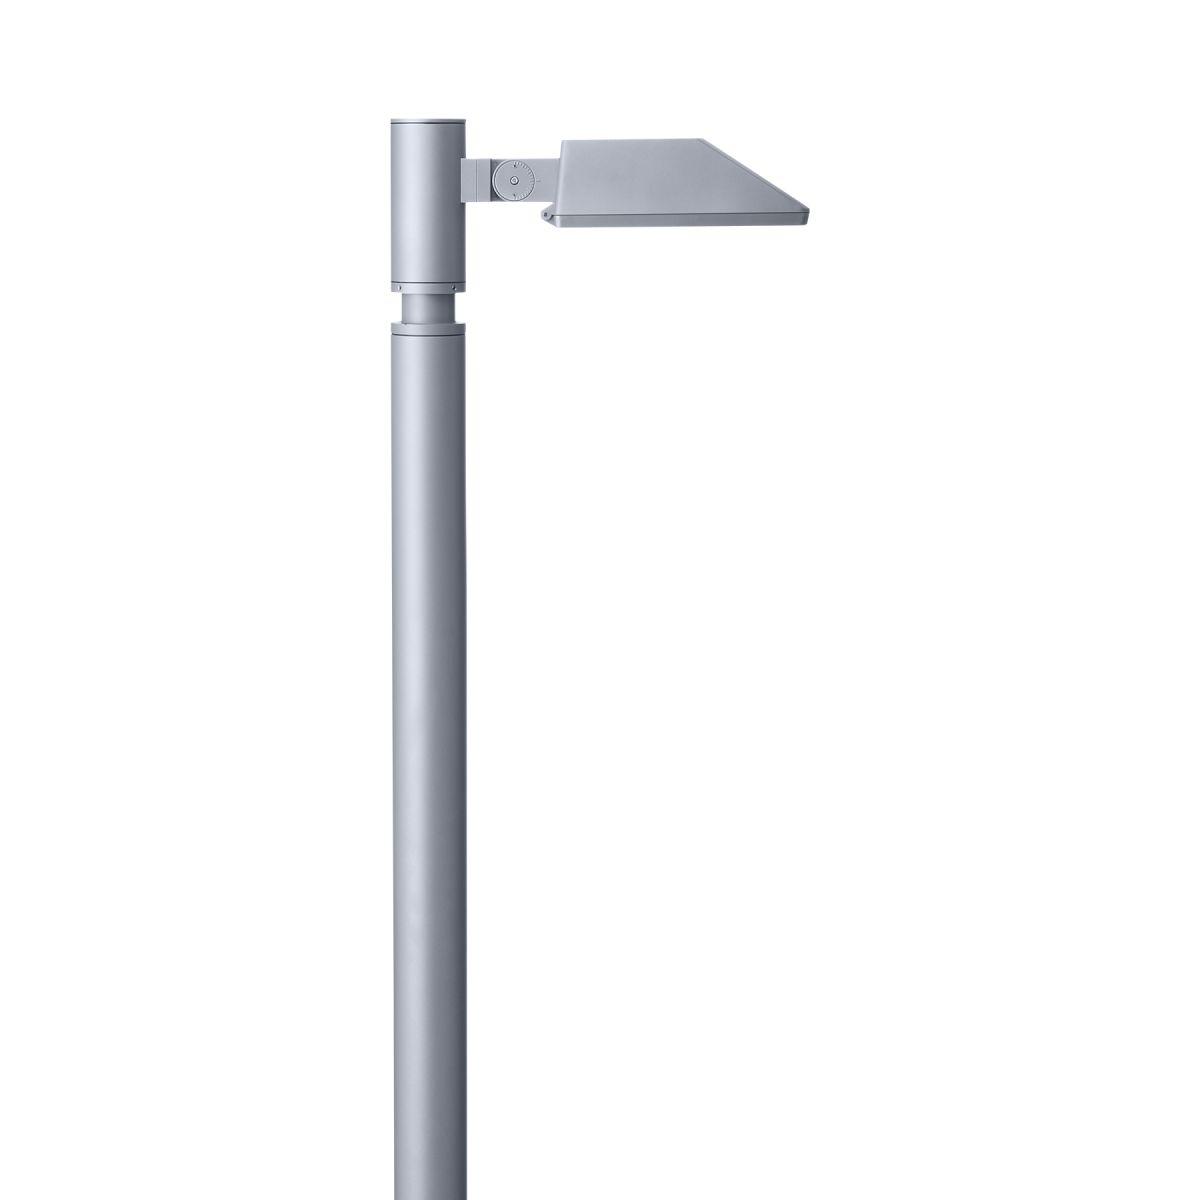 Small SIROCCO Optic - Area Light / Road Optic Single Sided